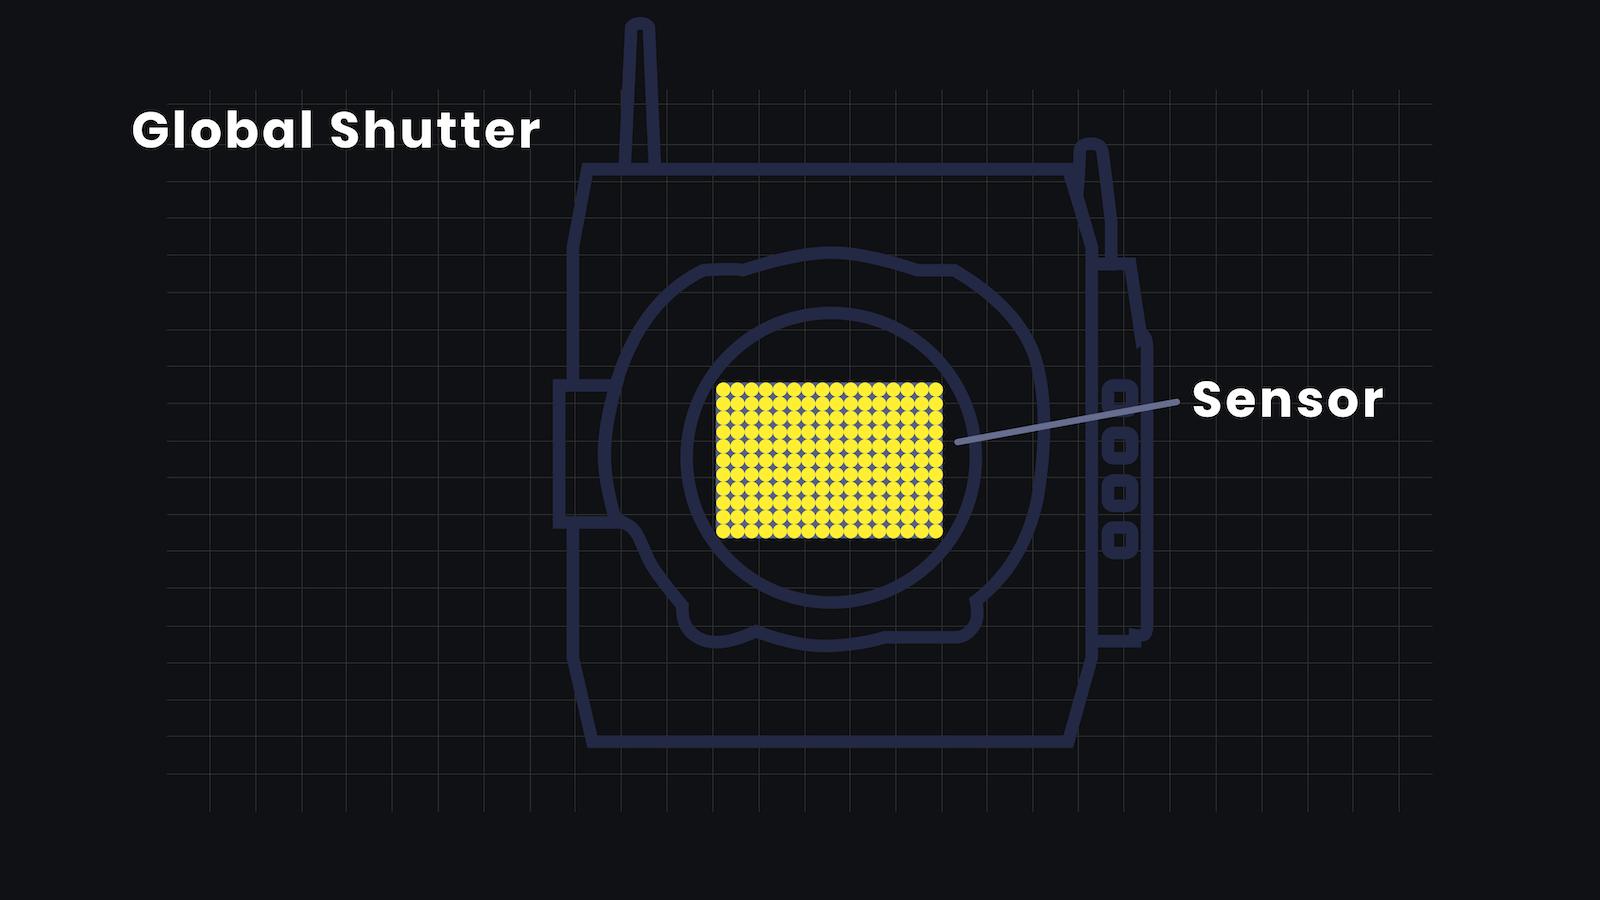 Ultimate Guide to Shutter Speed - Global Shutter